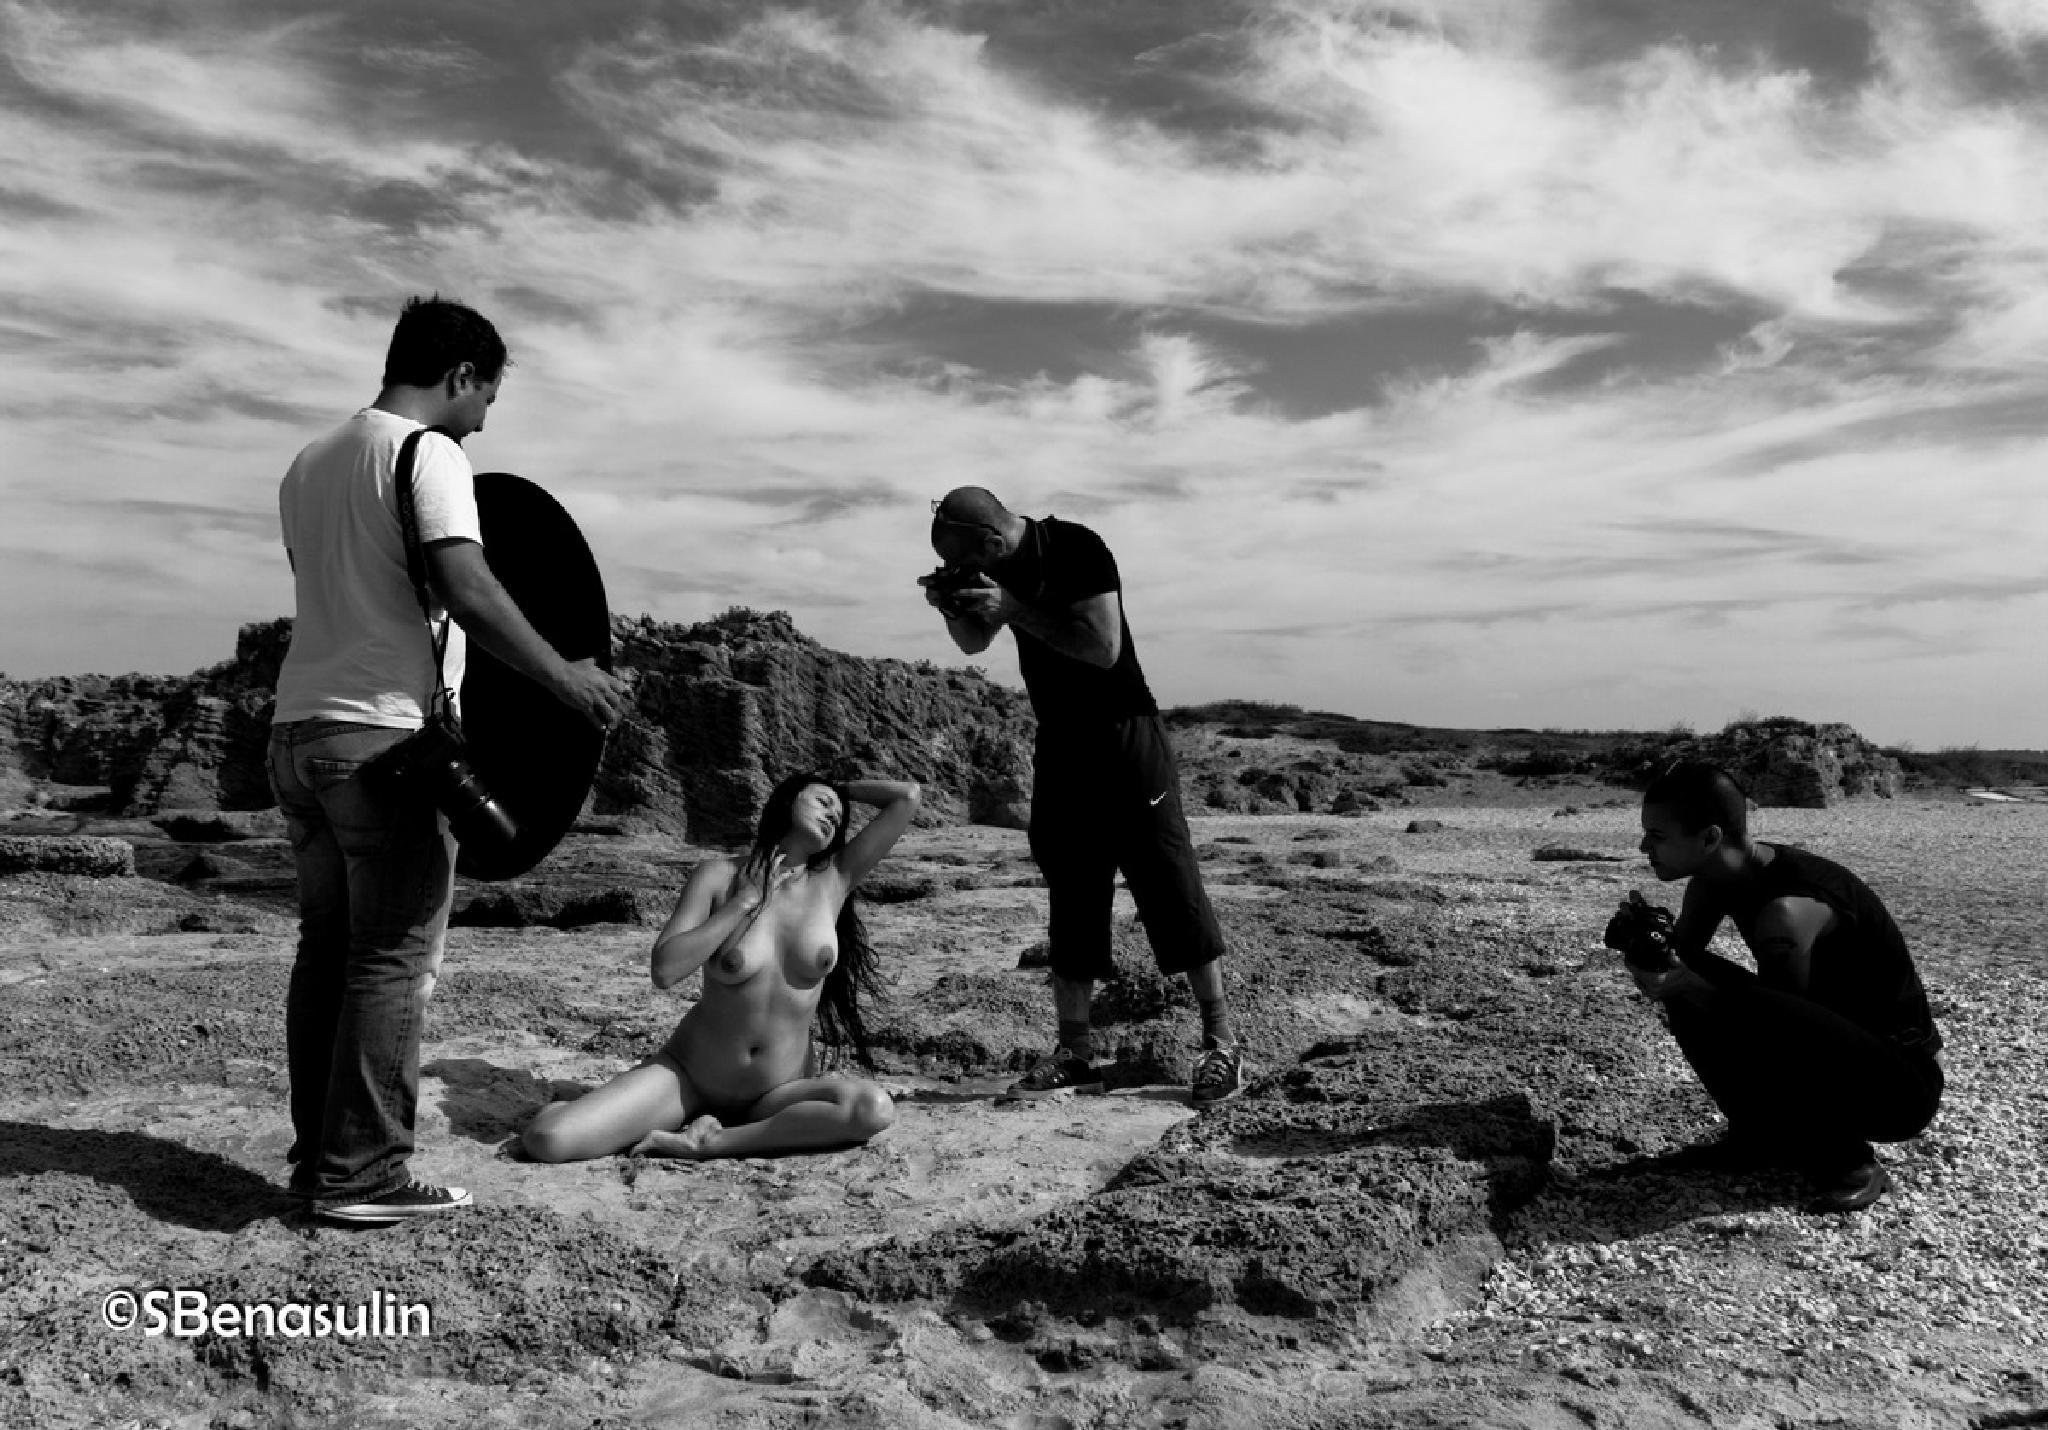 fotografos! by solange benasulin